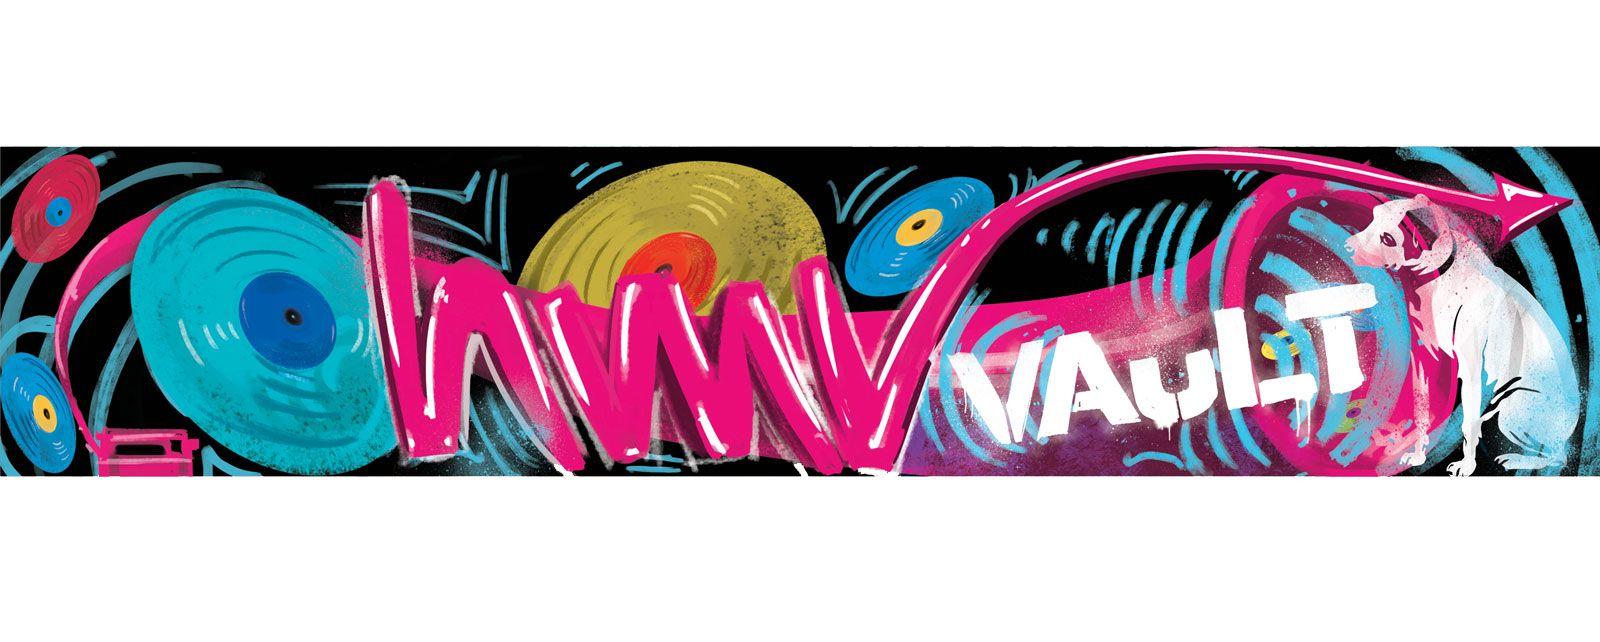 HMV-Wall-Artwork